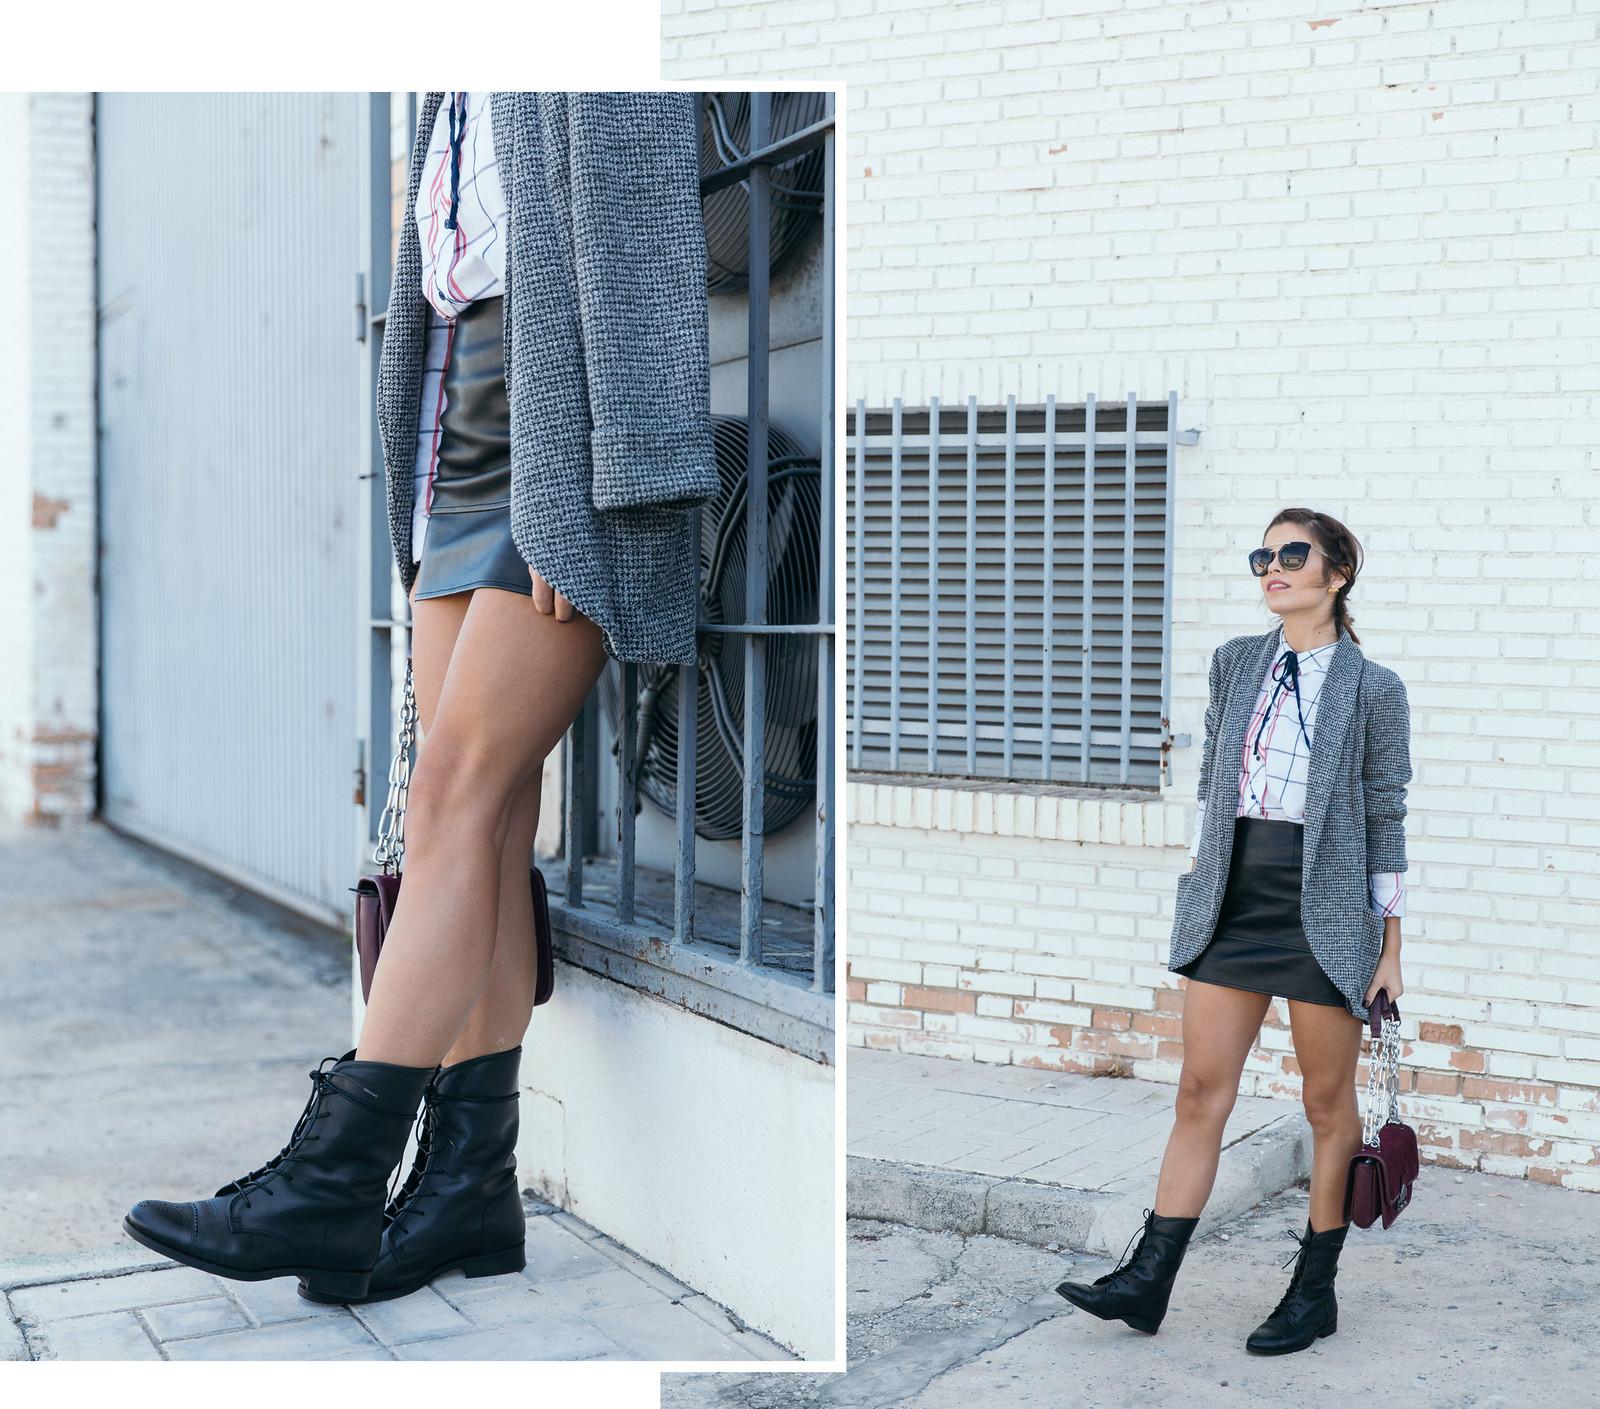 Jessie Chanes Seams for a desire - Black Boots Itshoes Parfois bag faux leather skirt-1